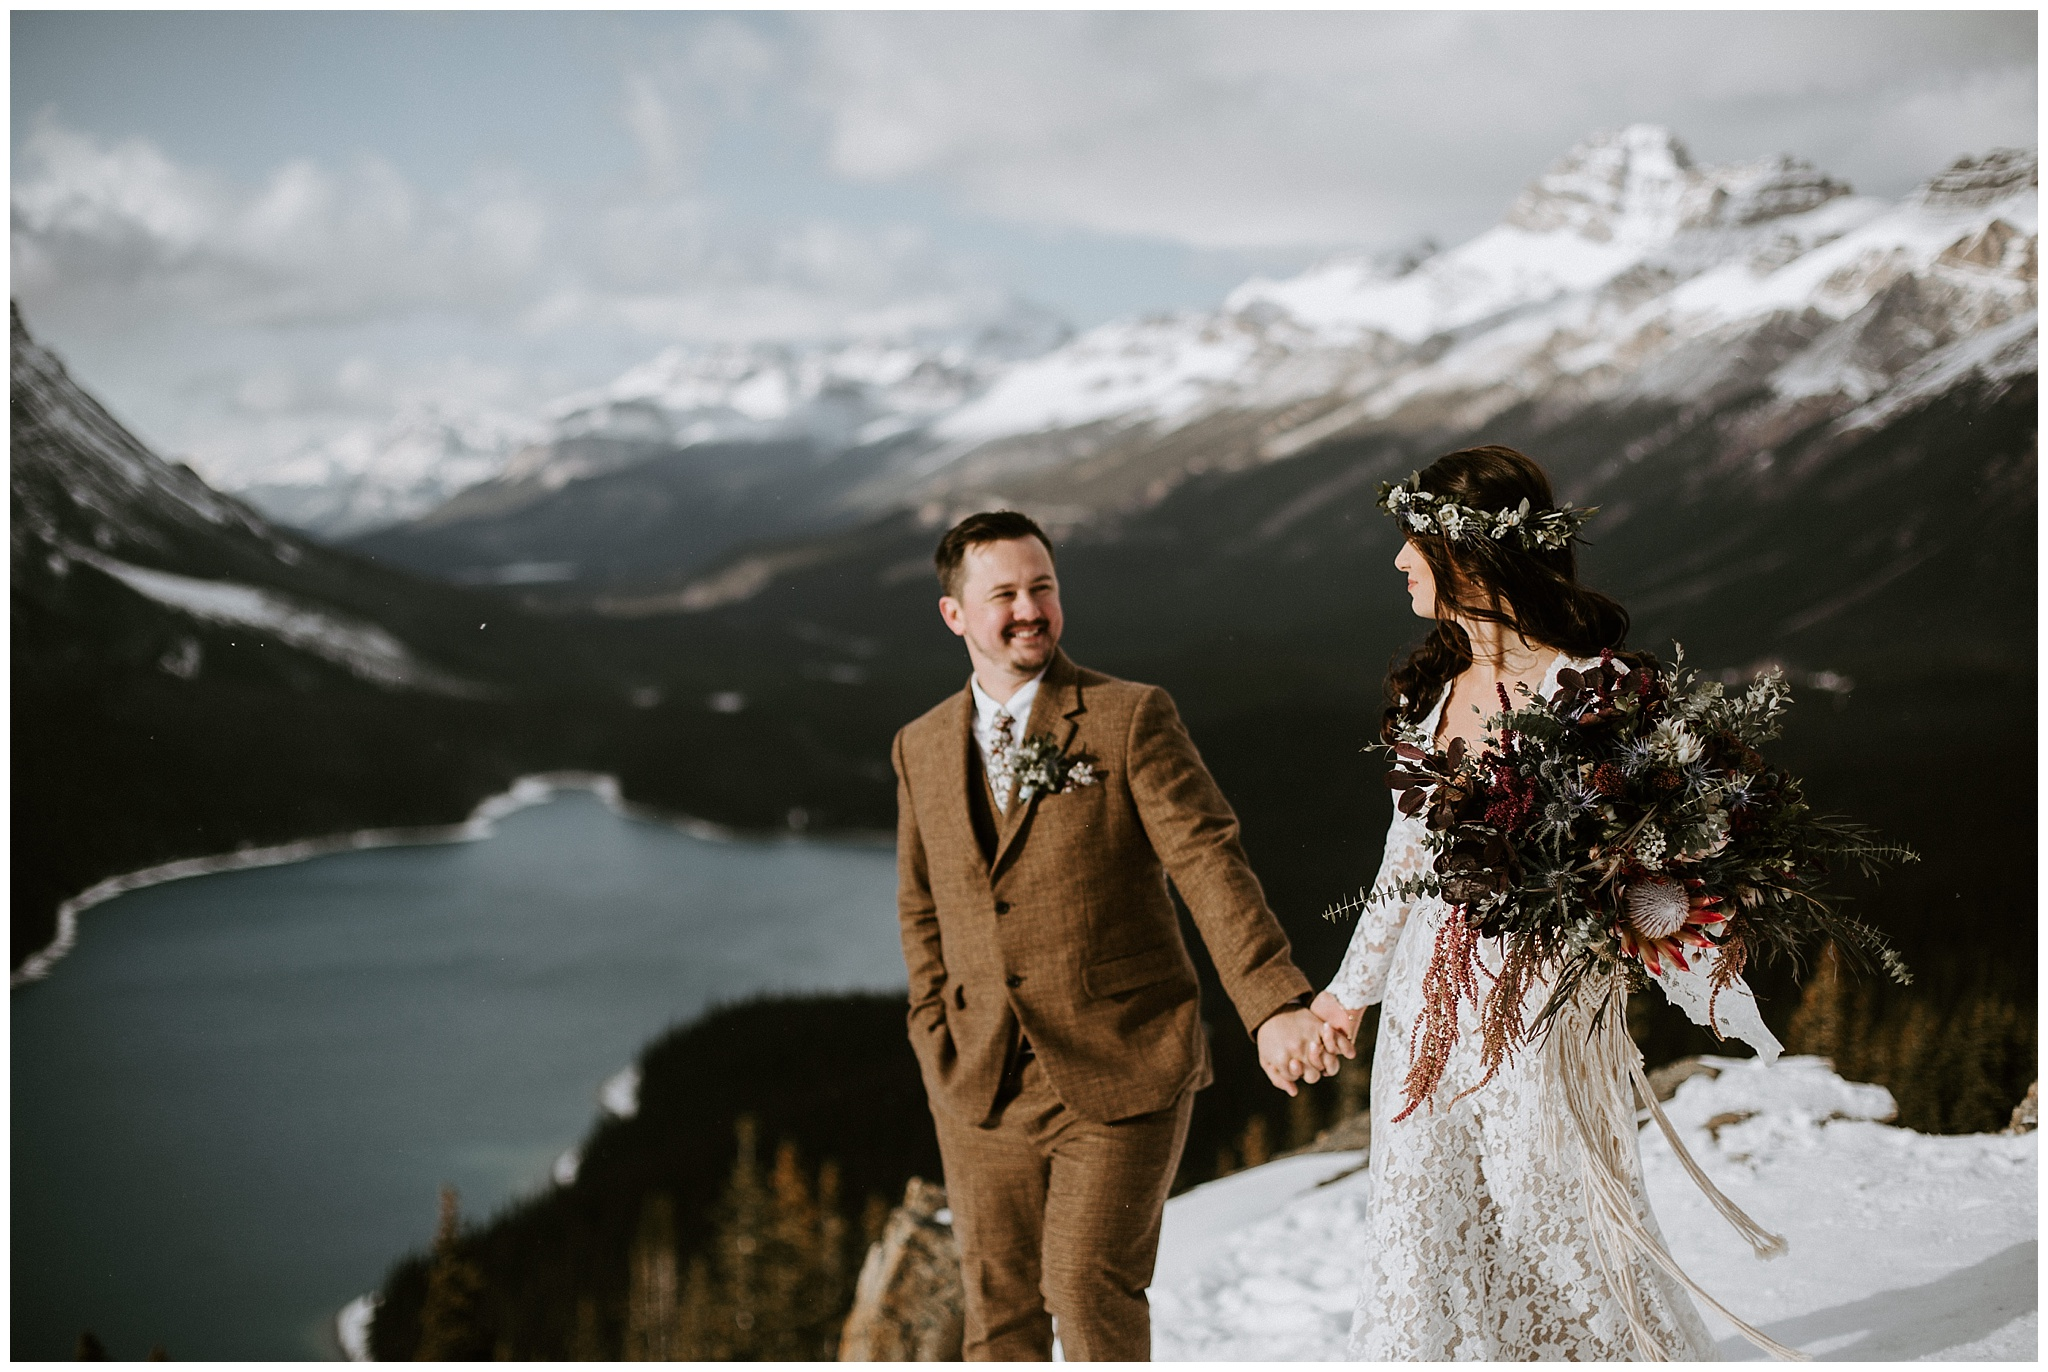 An intimate elopement at Peyto Lake in Jasper